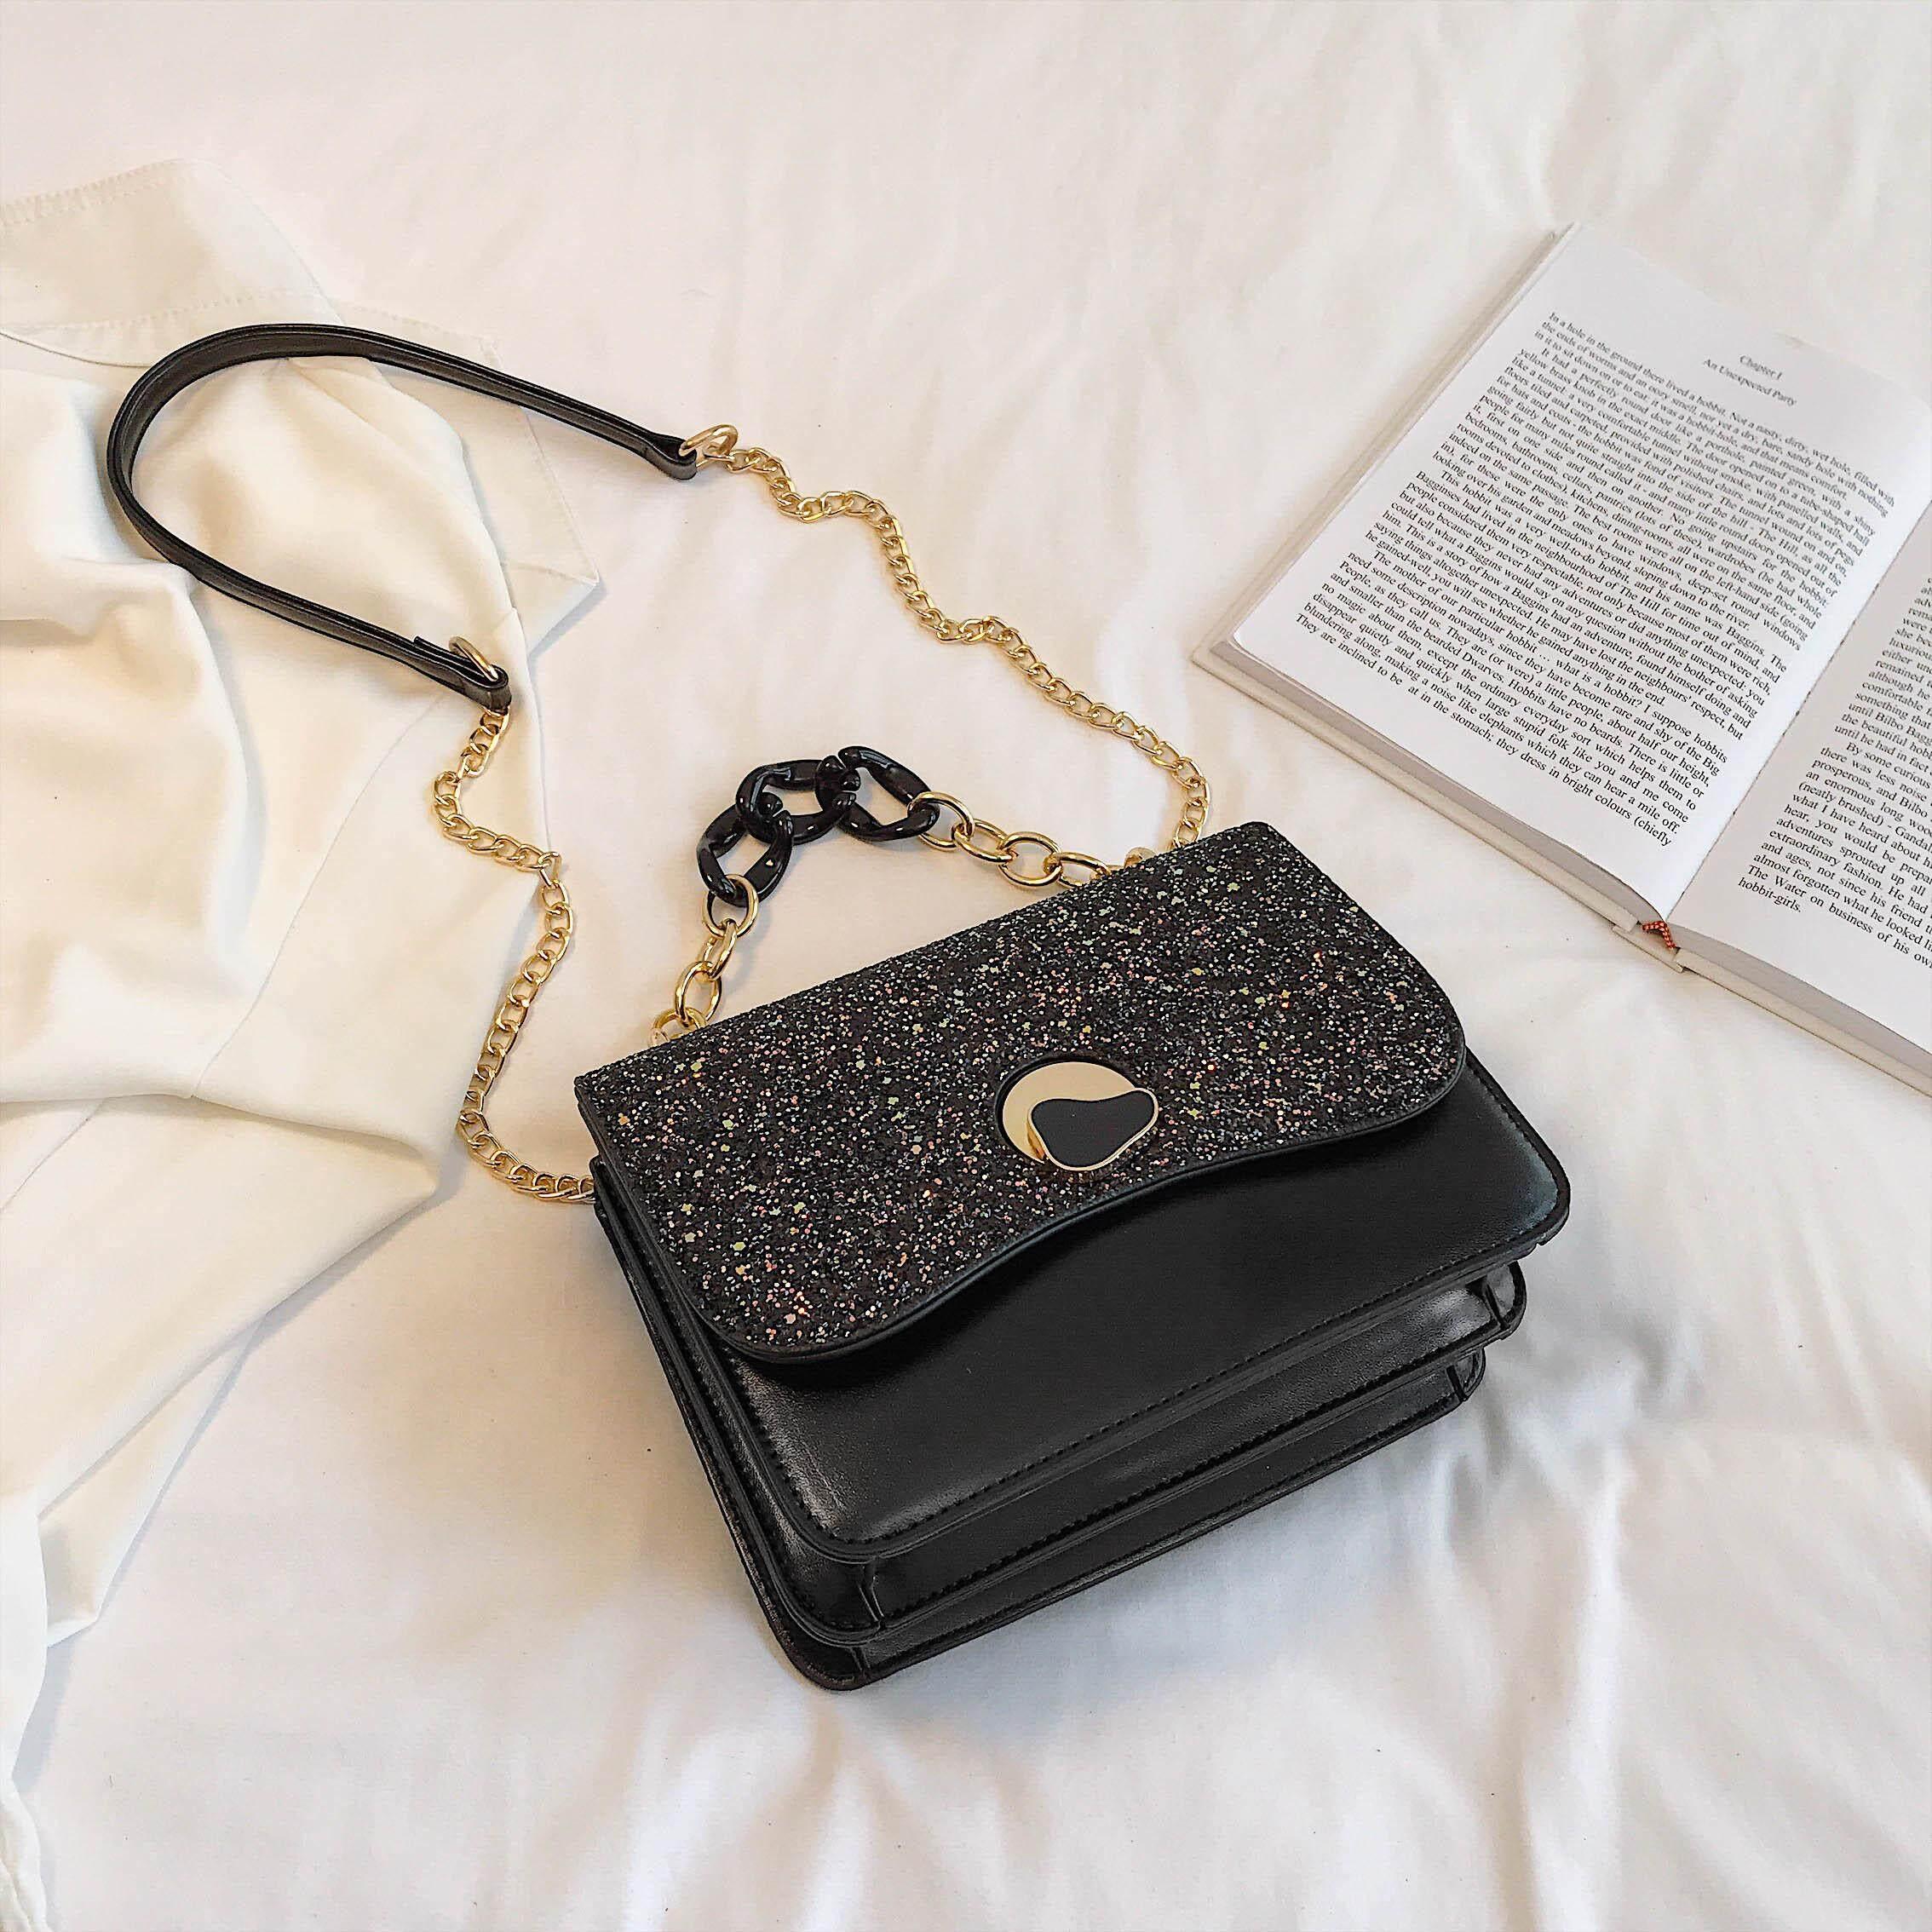 53f9c16f66d ZOQI New Fashion Women Messenger bags Cute Wild Version Of The Slung  Shoulder Small Square Bag Trend Mini Women Handbags Bag